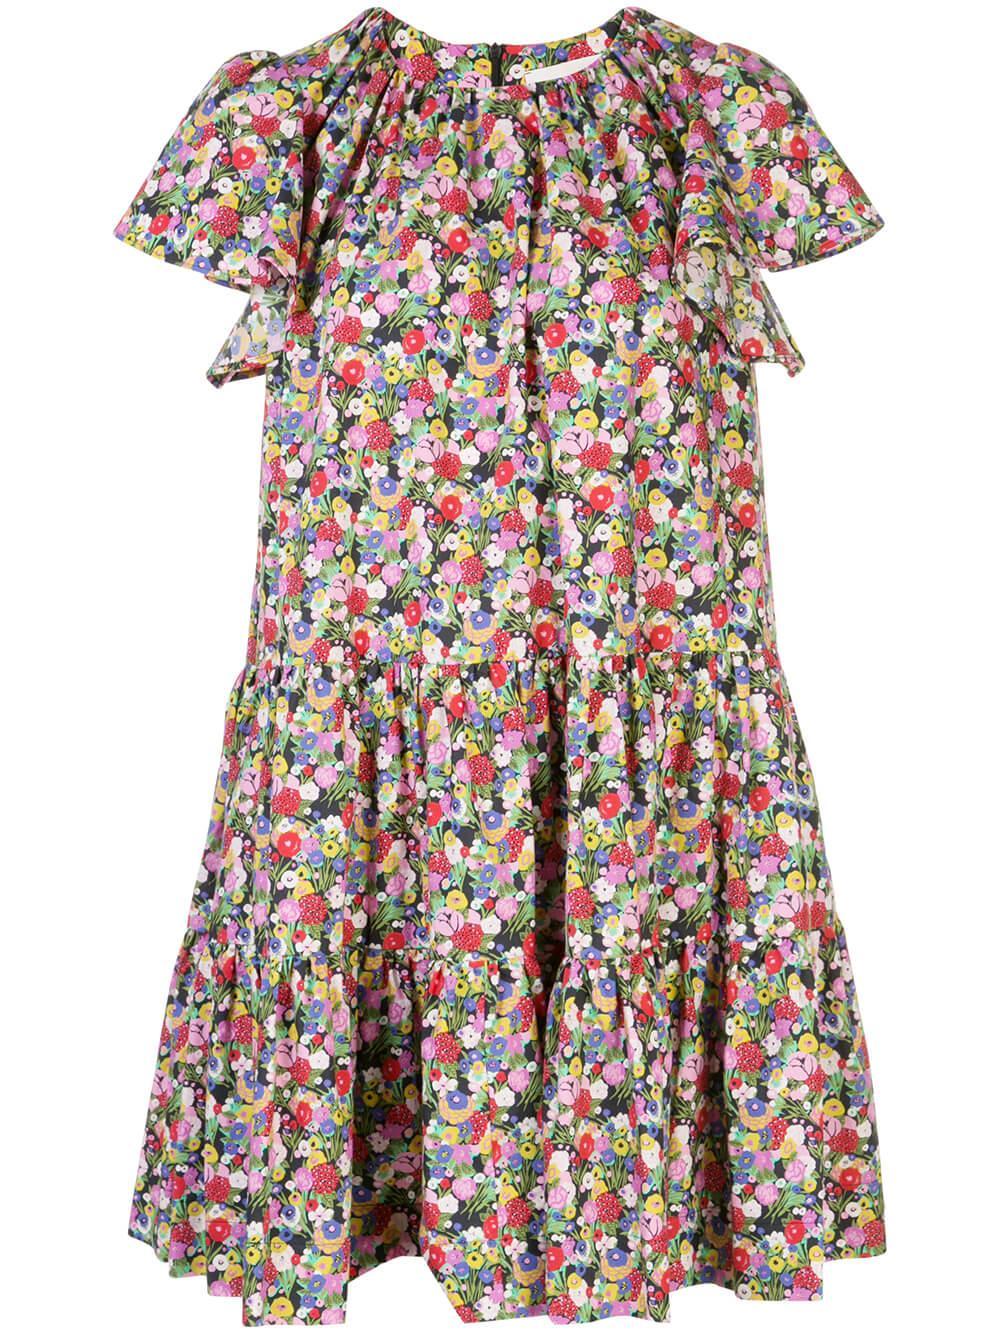 Snow Drop Floral Swing Dress Item # DRE0111-COT001